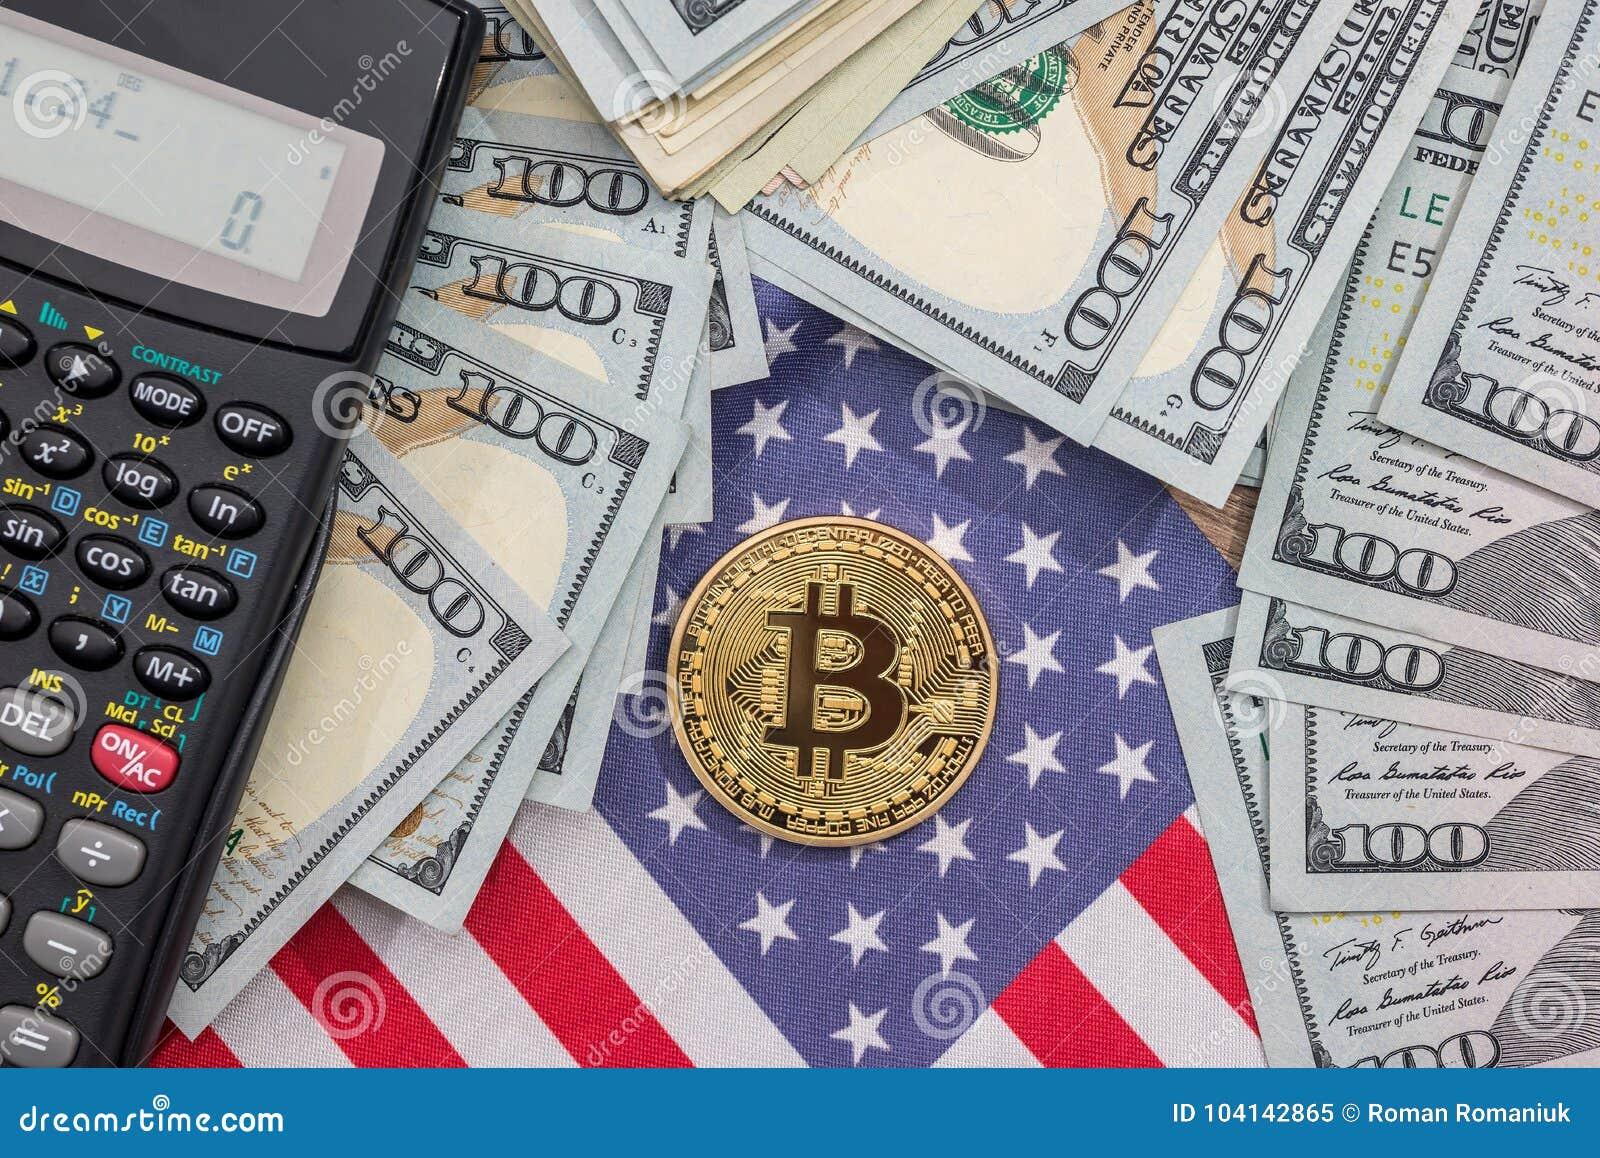 bitcoin, us flag, calculator and dollar